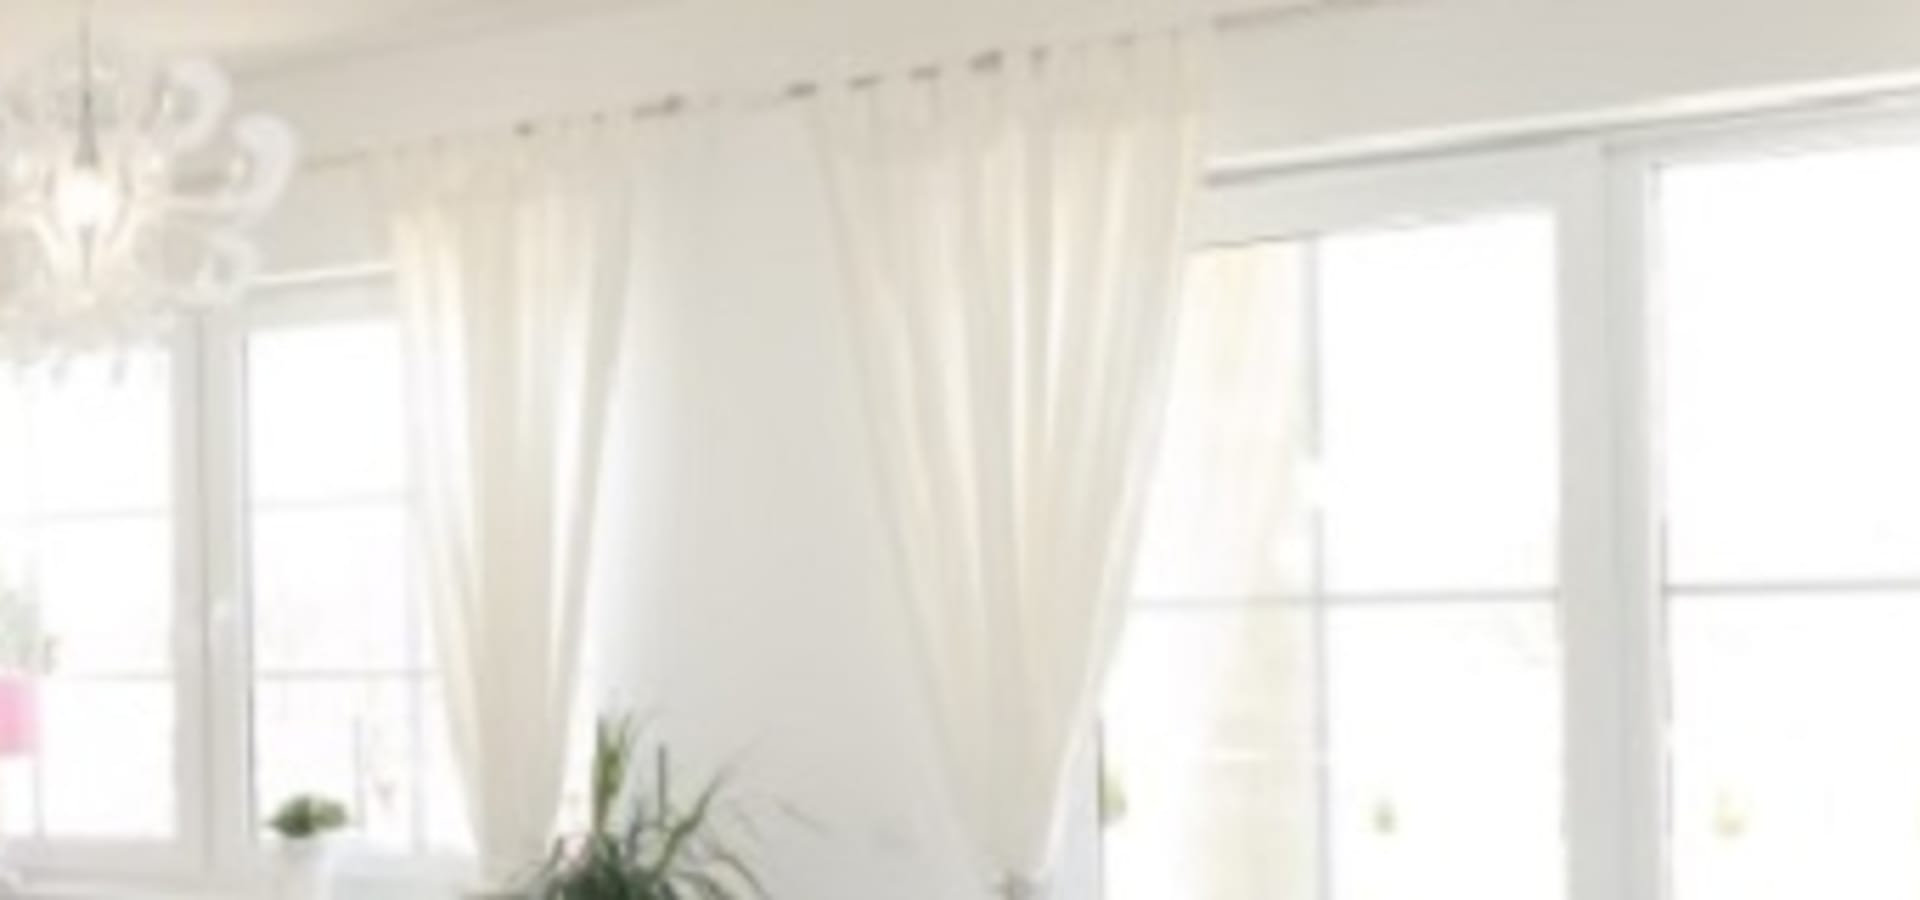 kunststoff fenster wei von kaminski und kaminski gbr homify. Black Bedroom Furniture Sets. Home Design Ideas